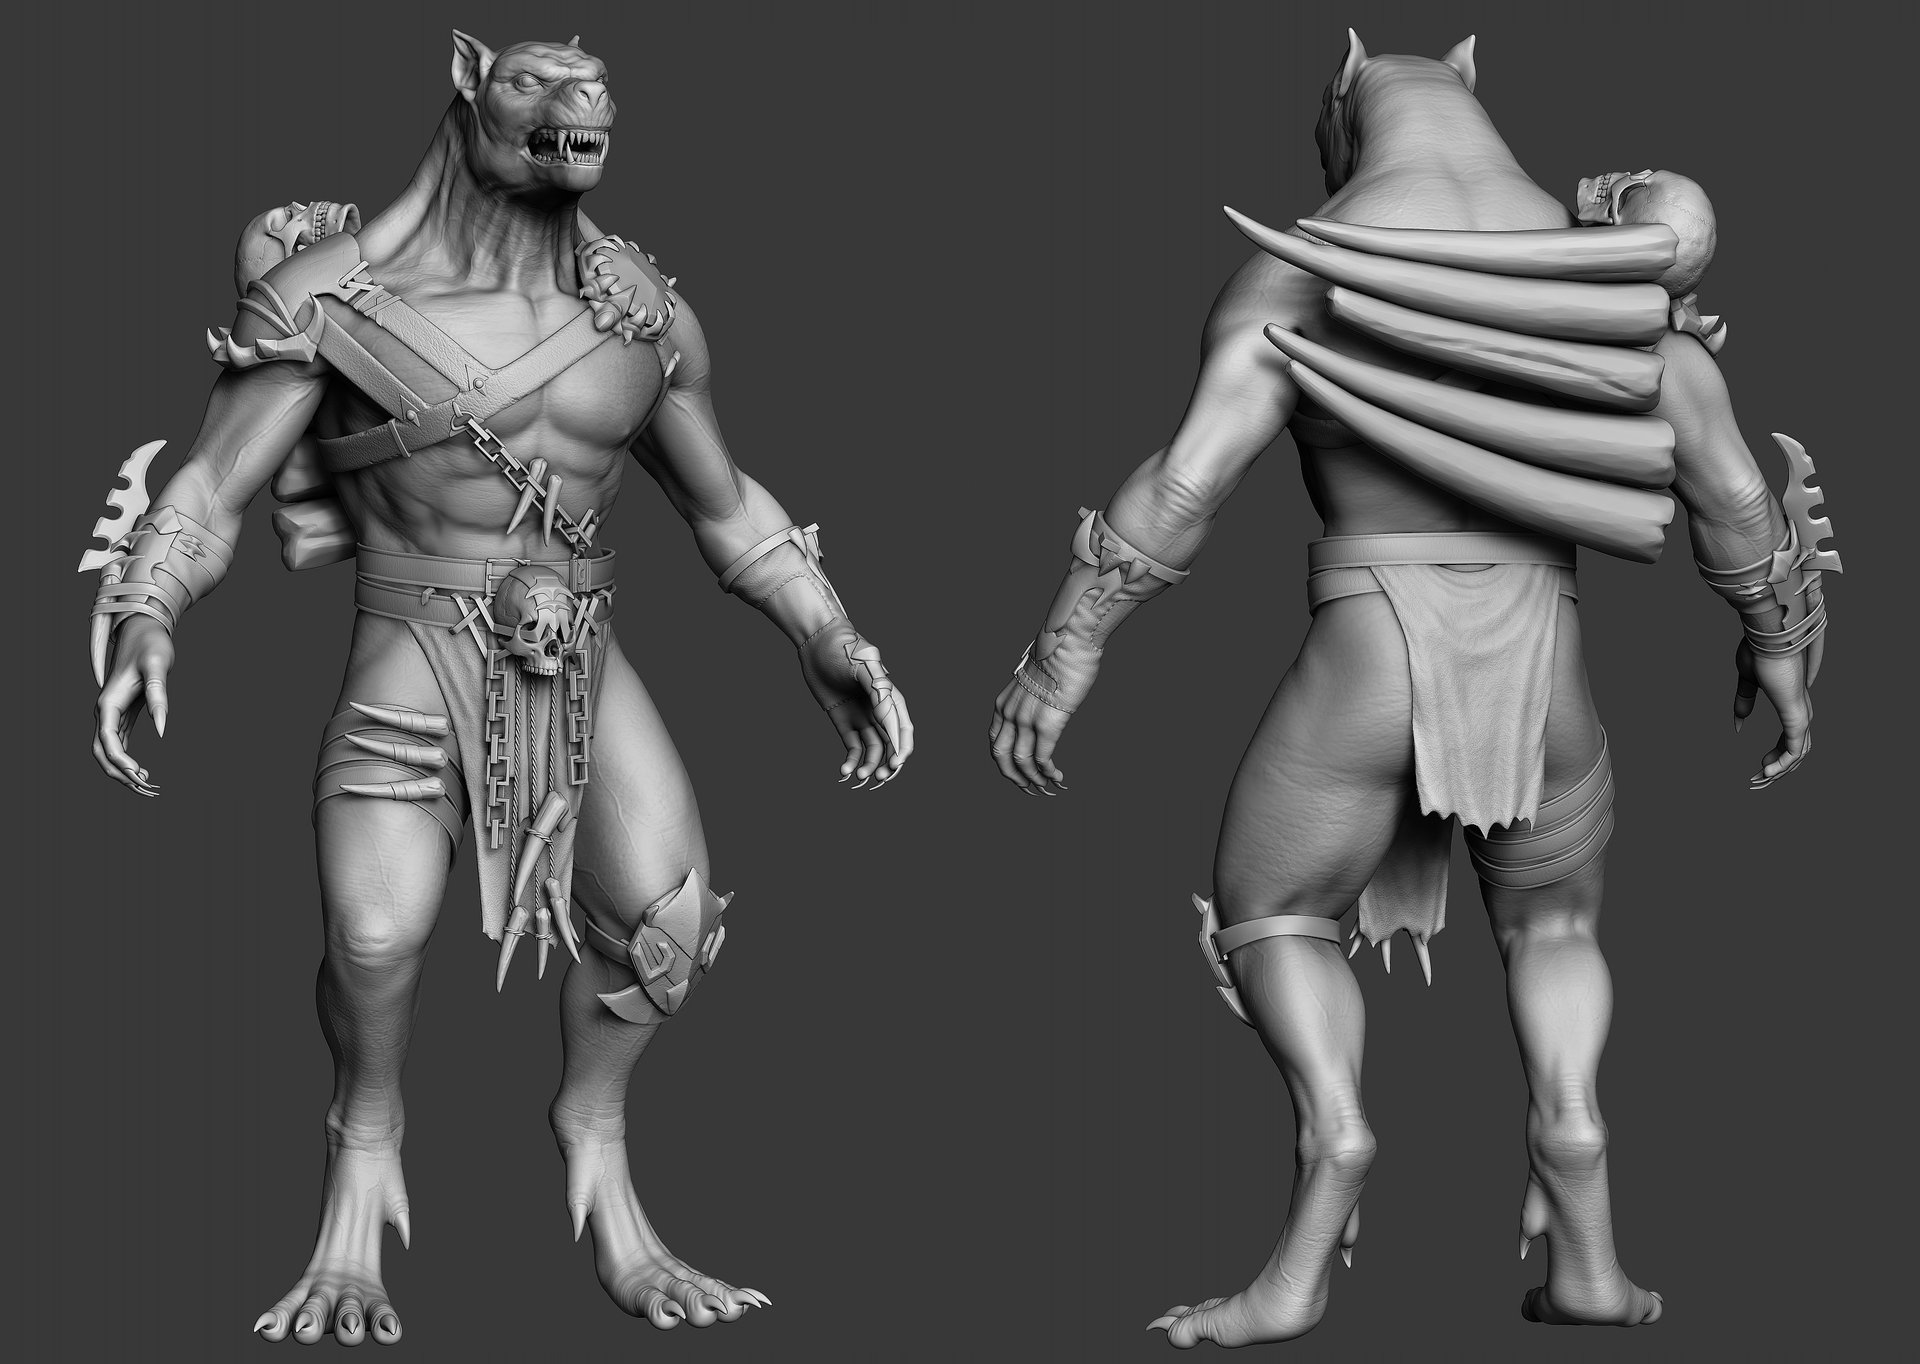 angel-bedolla-werewolf-work-in-progress-perspective.jpg?1435553288